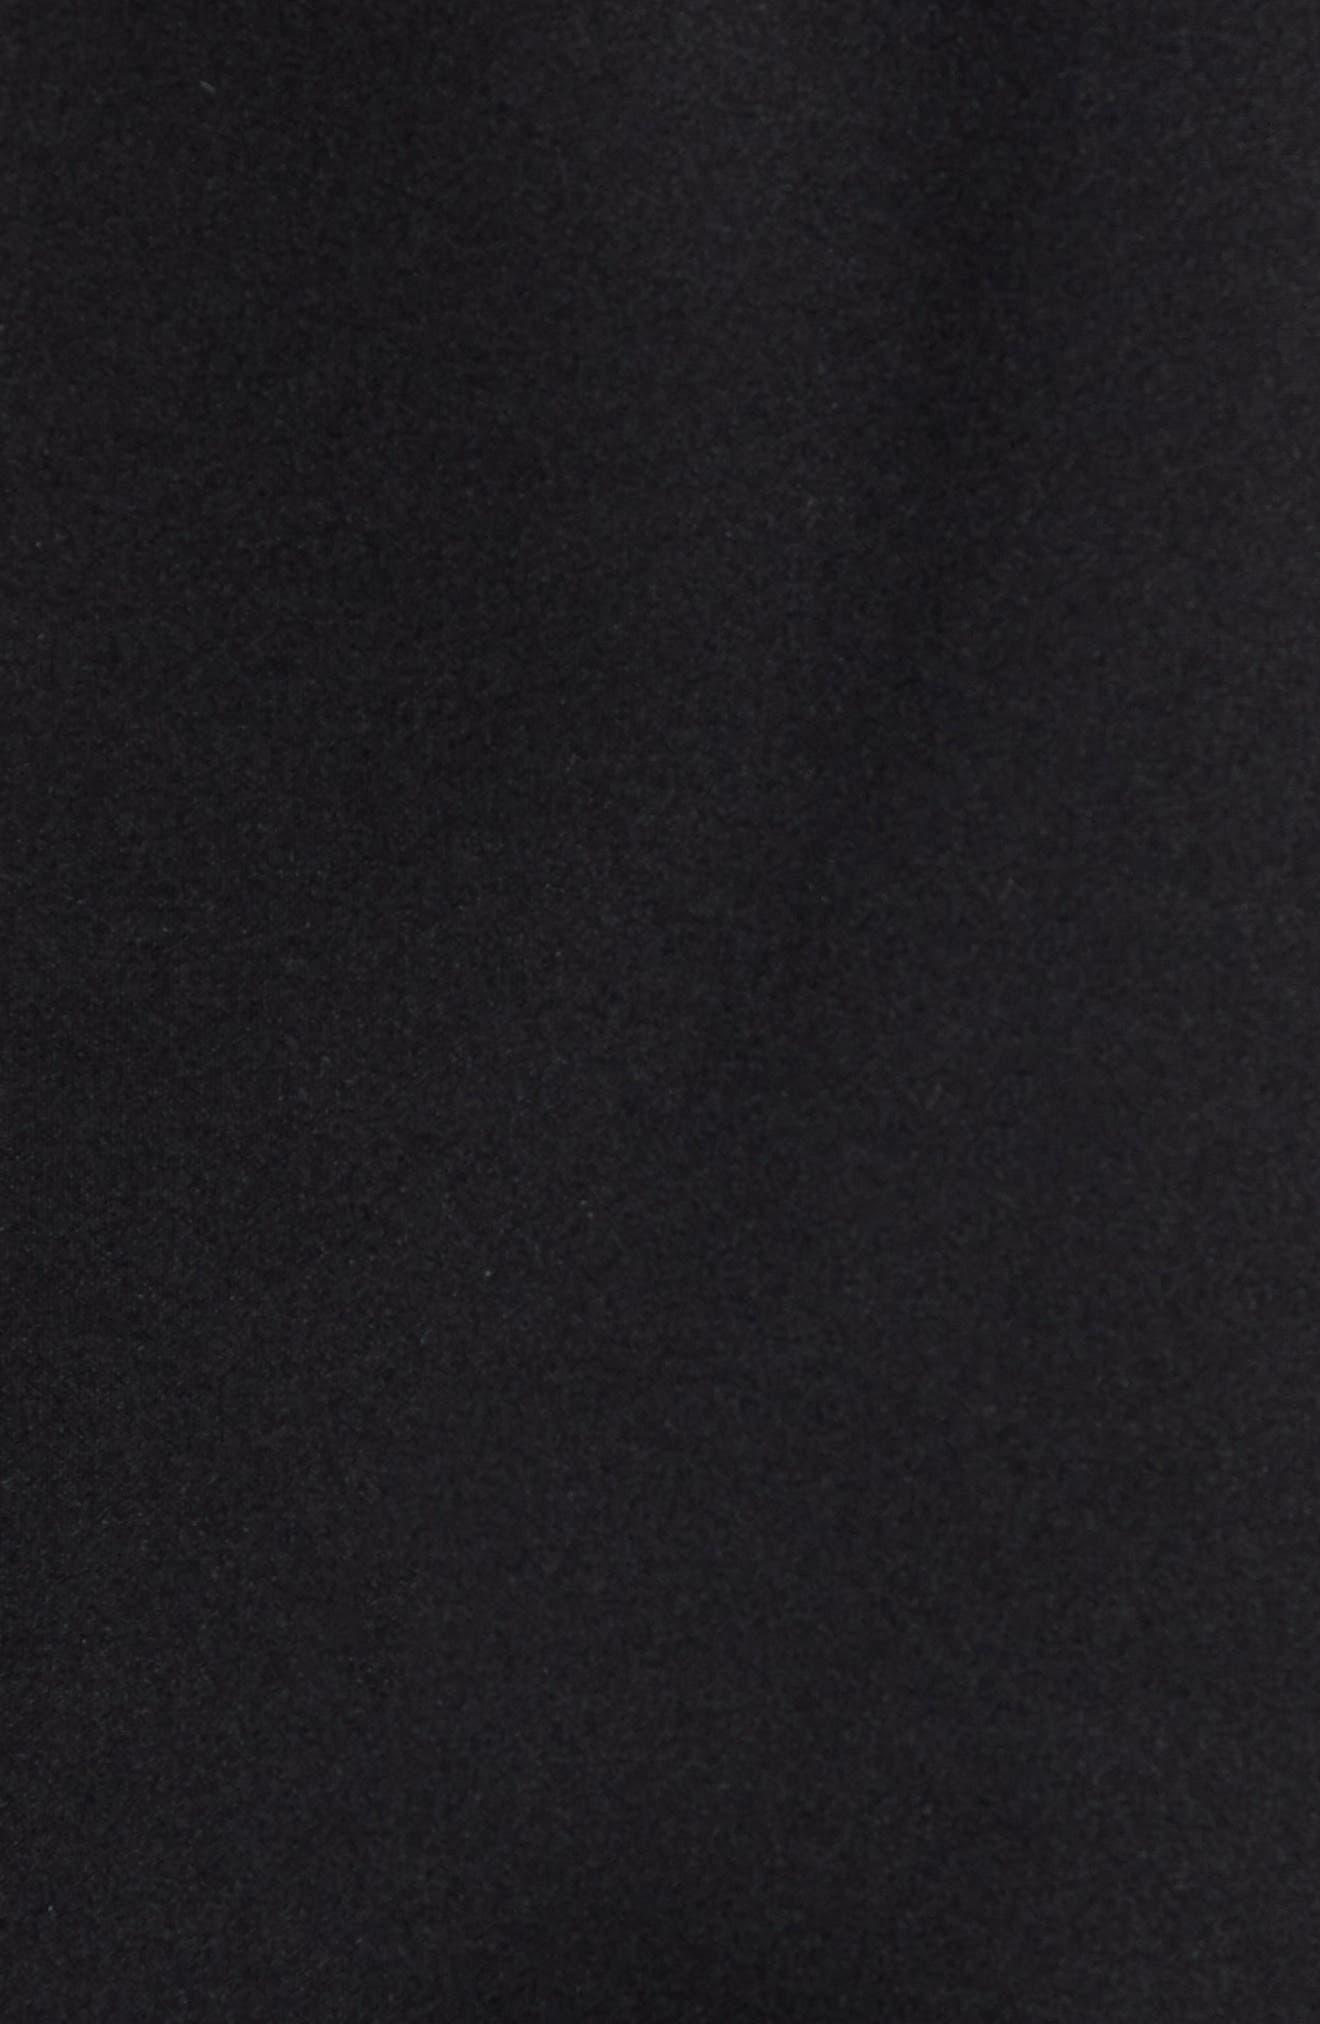 Tactic Hooded Fleece Jacket,                             Alternate thumbnail 7, color,                             BLACK